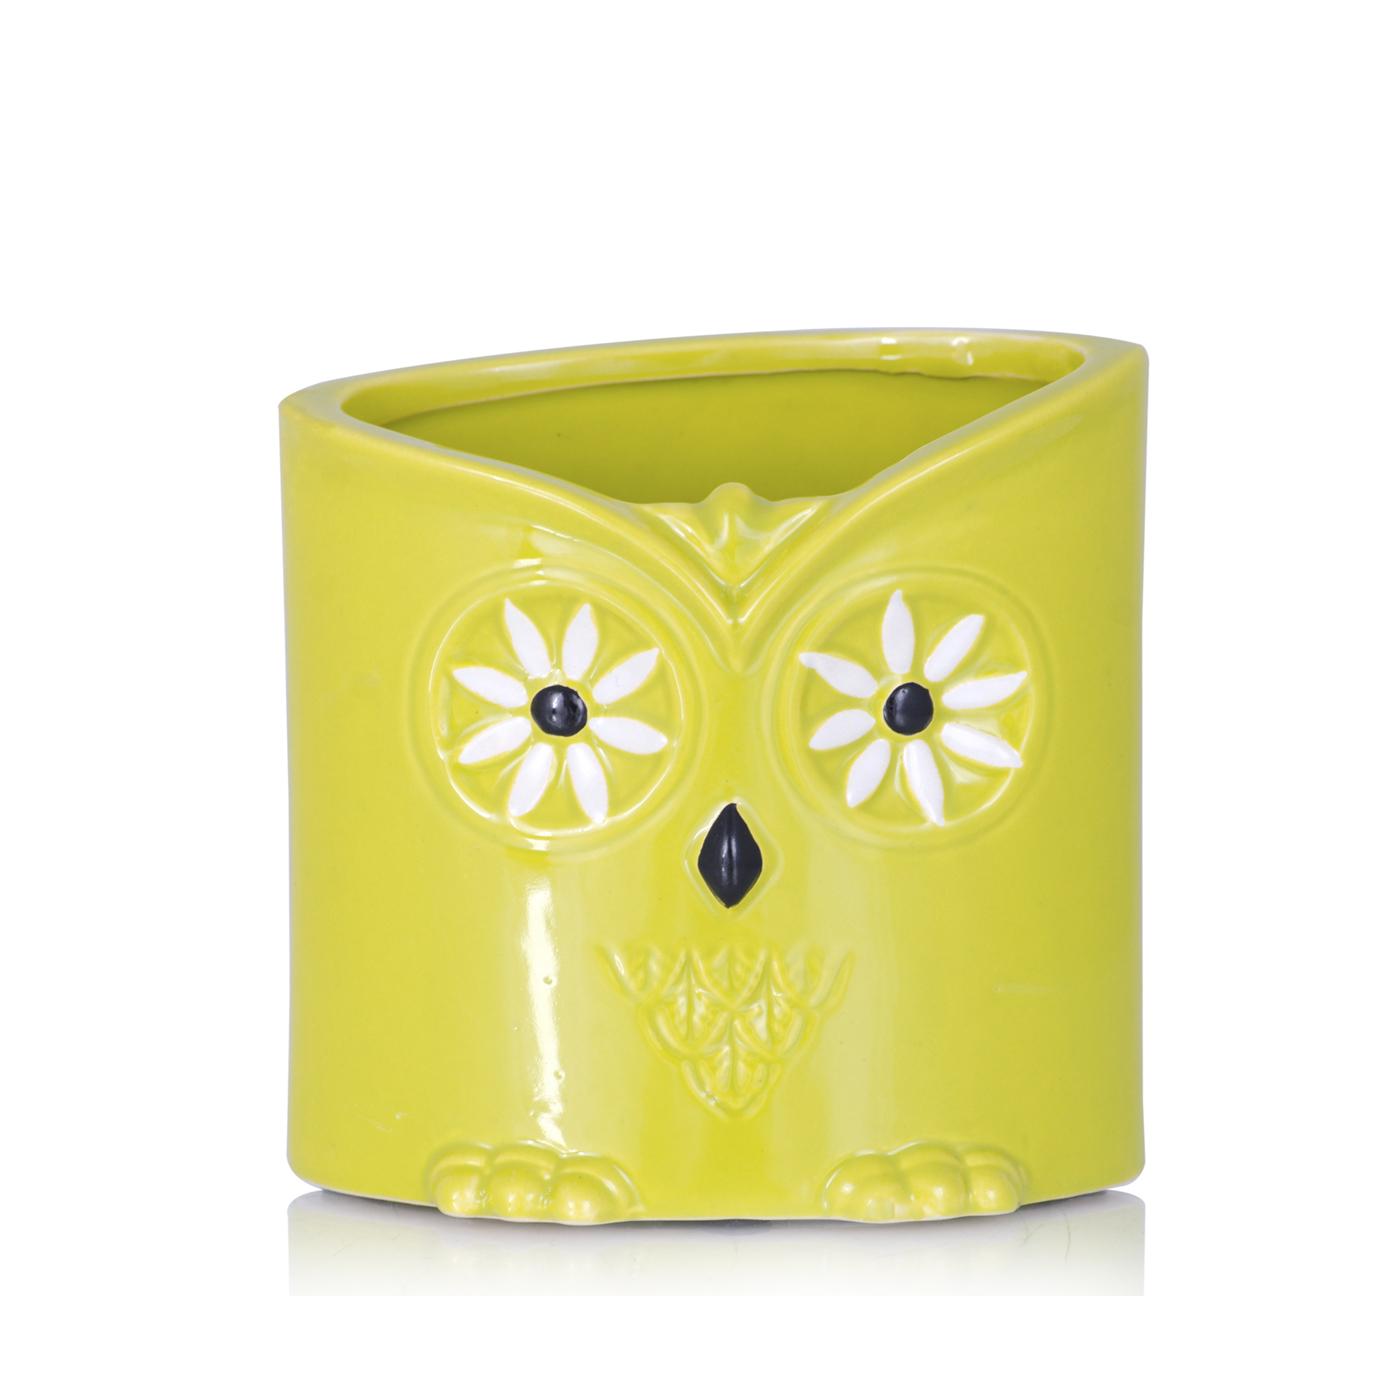 {} Home Philosophy Ваза Ezra Цвет: Желтый (7х12х13 см) ваза сияние цвет желтый 51 см 1984744